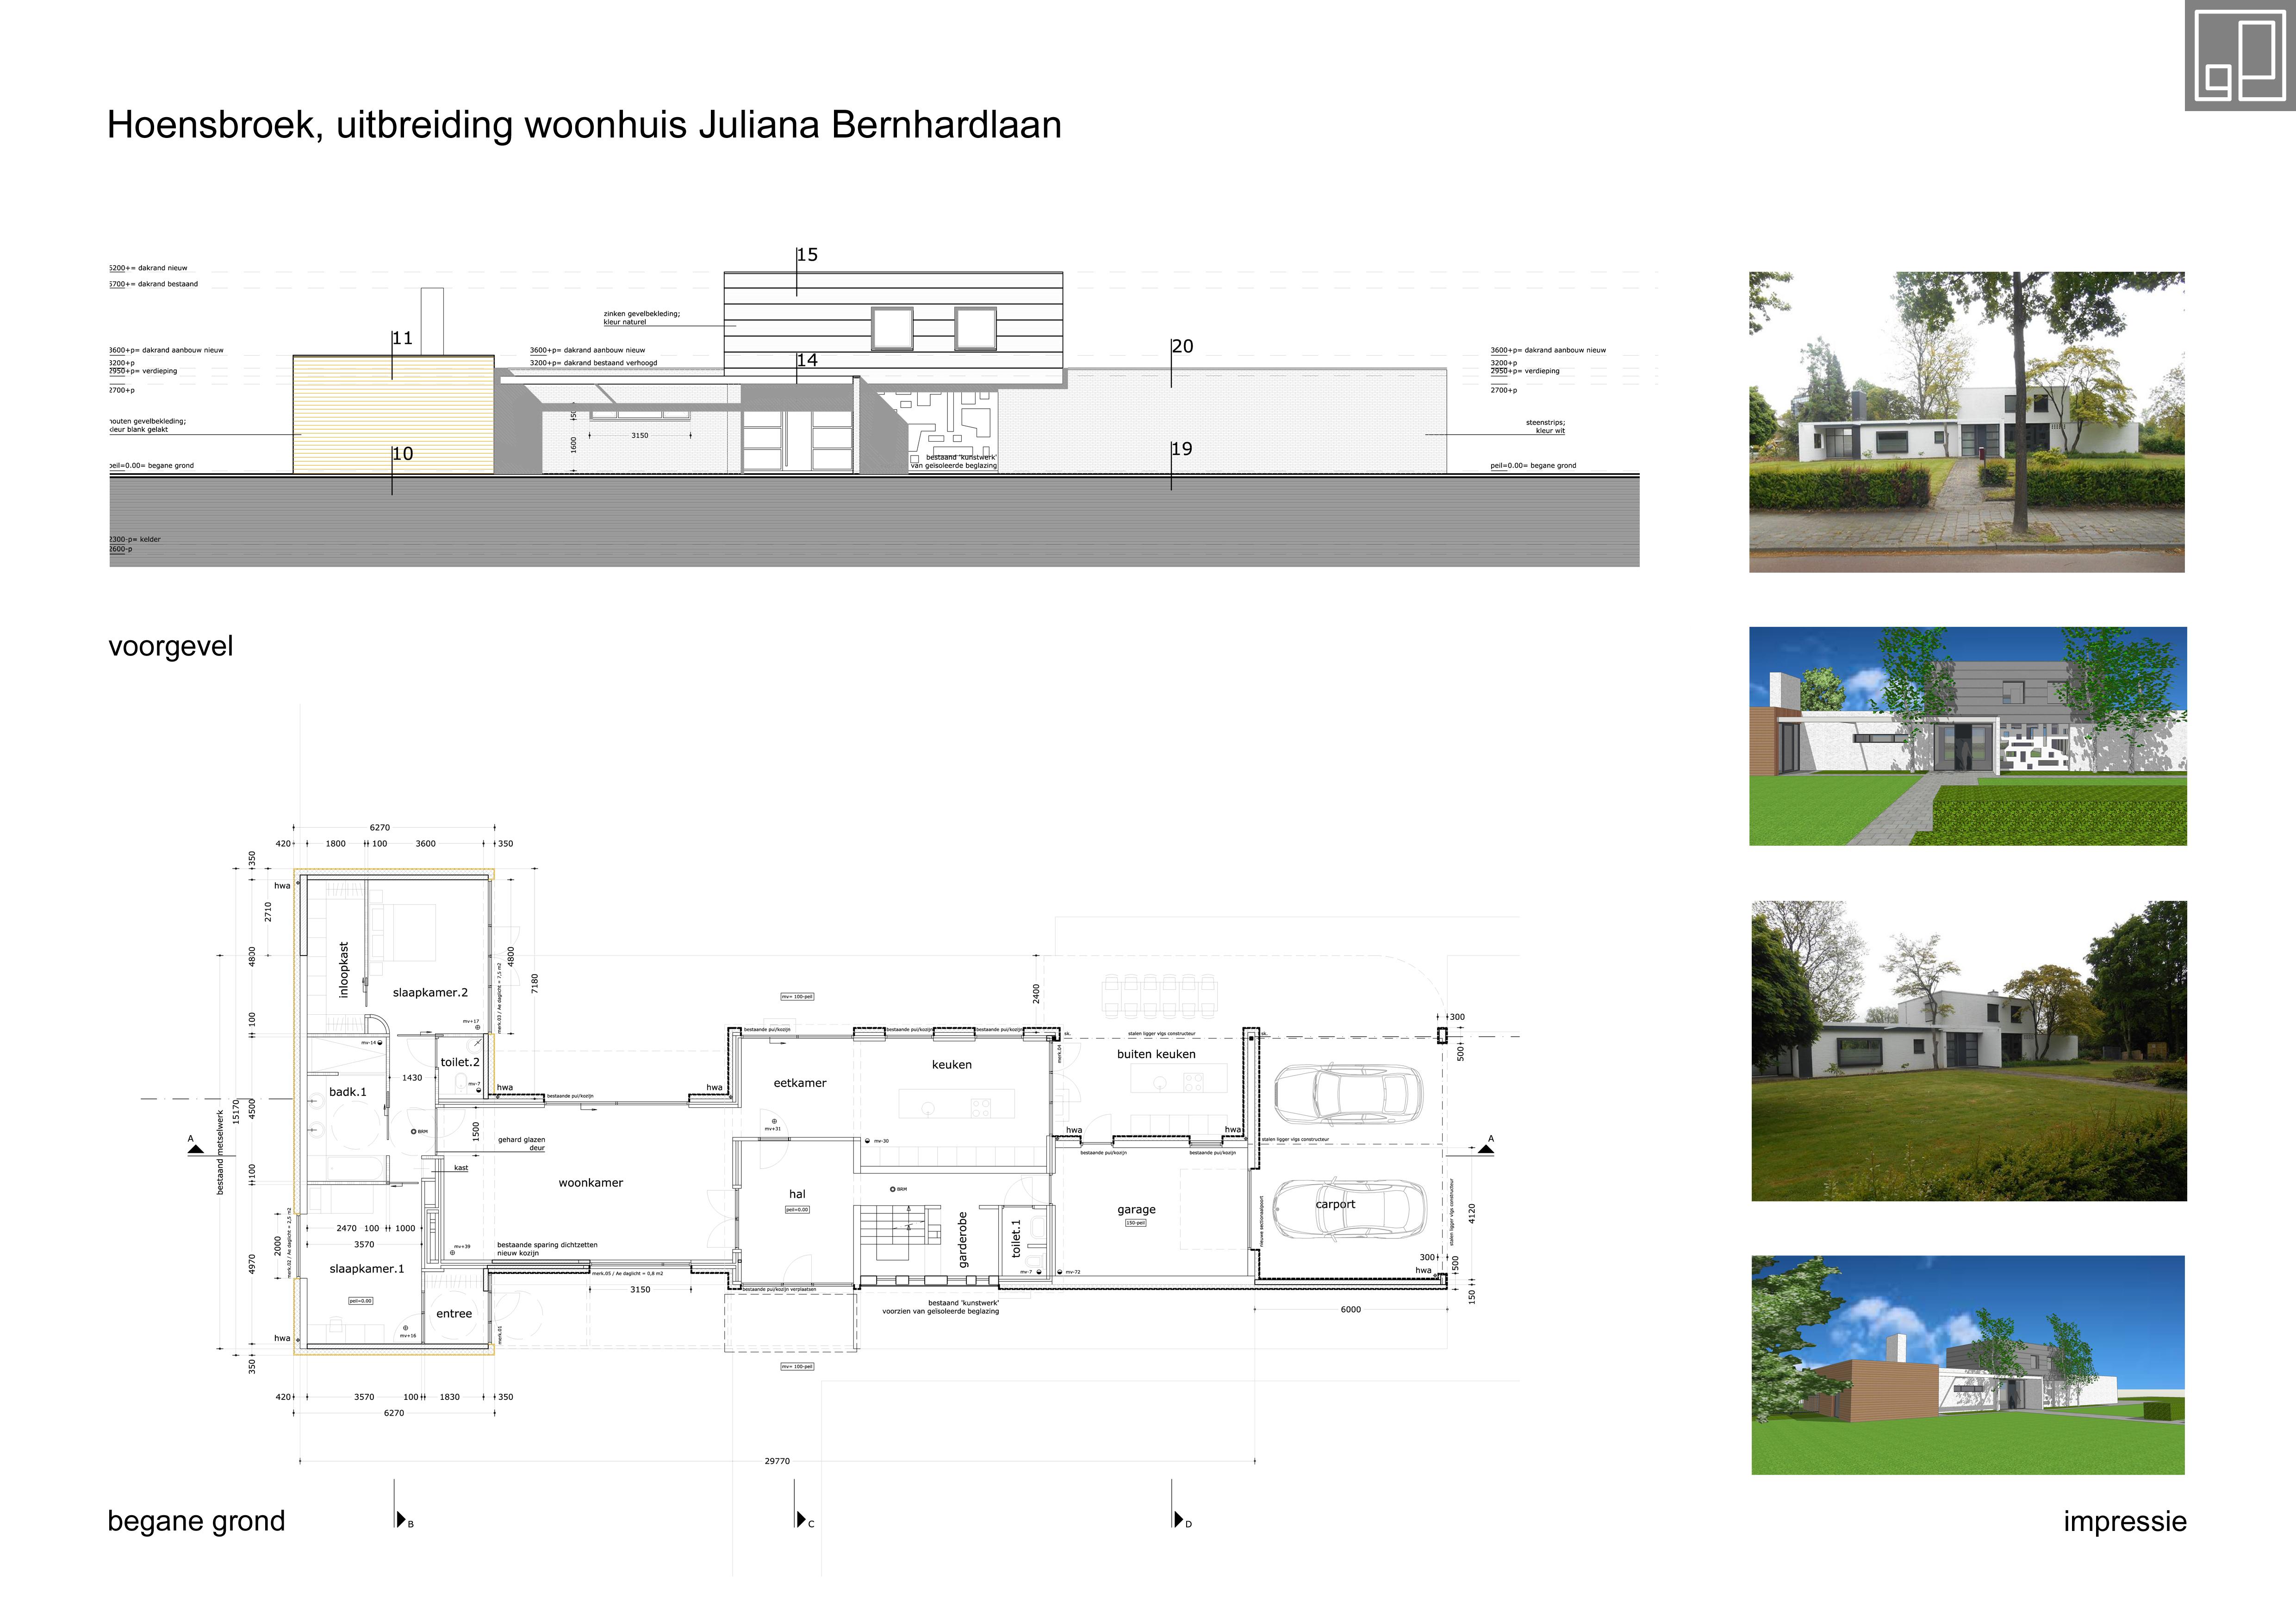 Uitbreiding woonhuis Hoensbroek